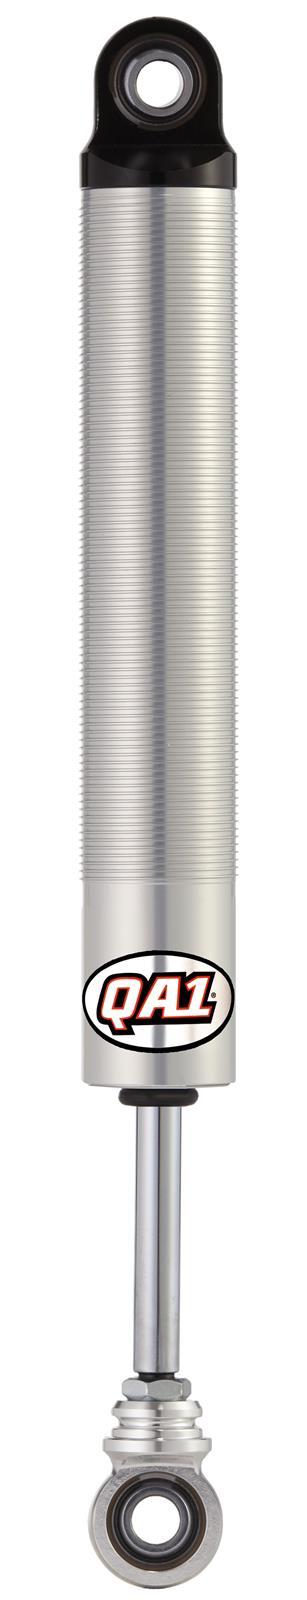 8294 Small Body Shock QA1 Aluminum